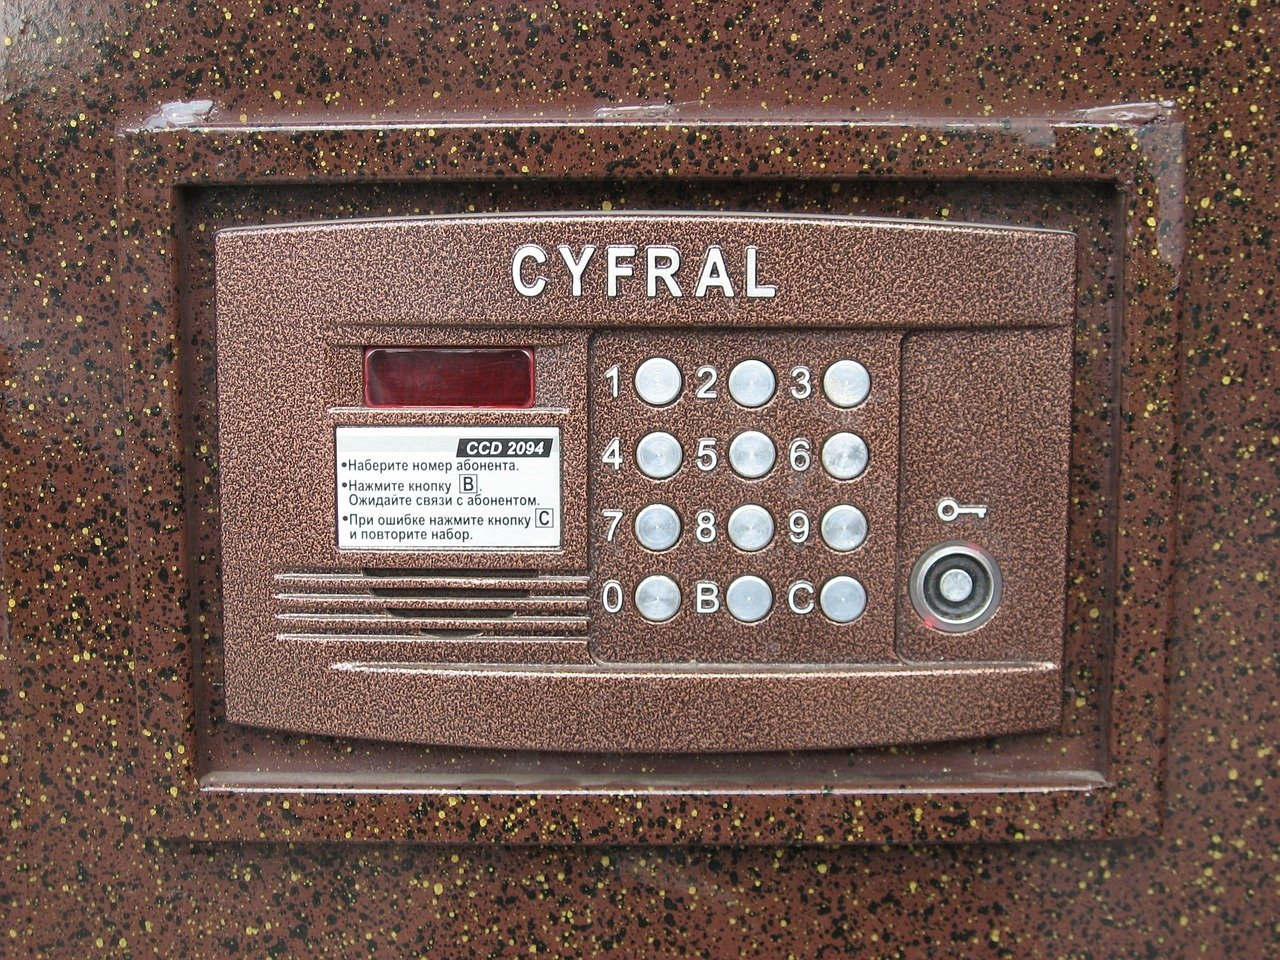 DIY - High Tech Door Security - RealtyBizNews: Real Estate ...